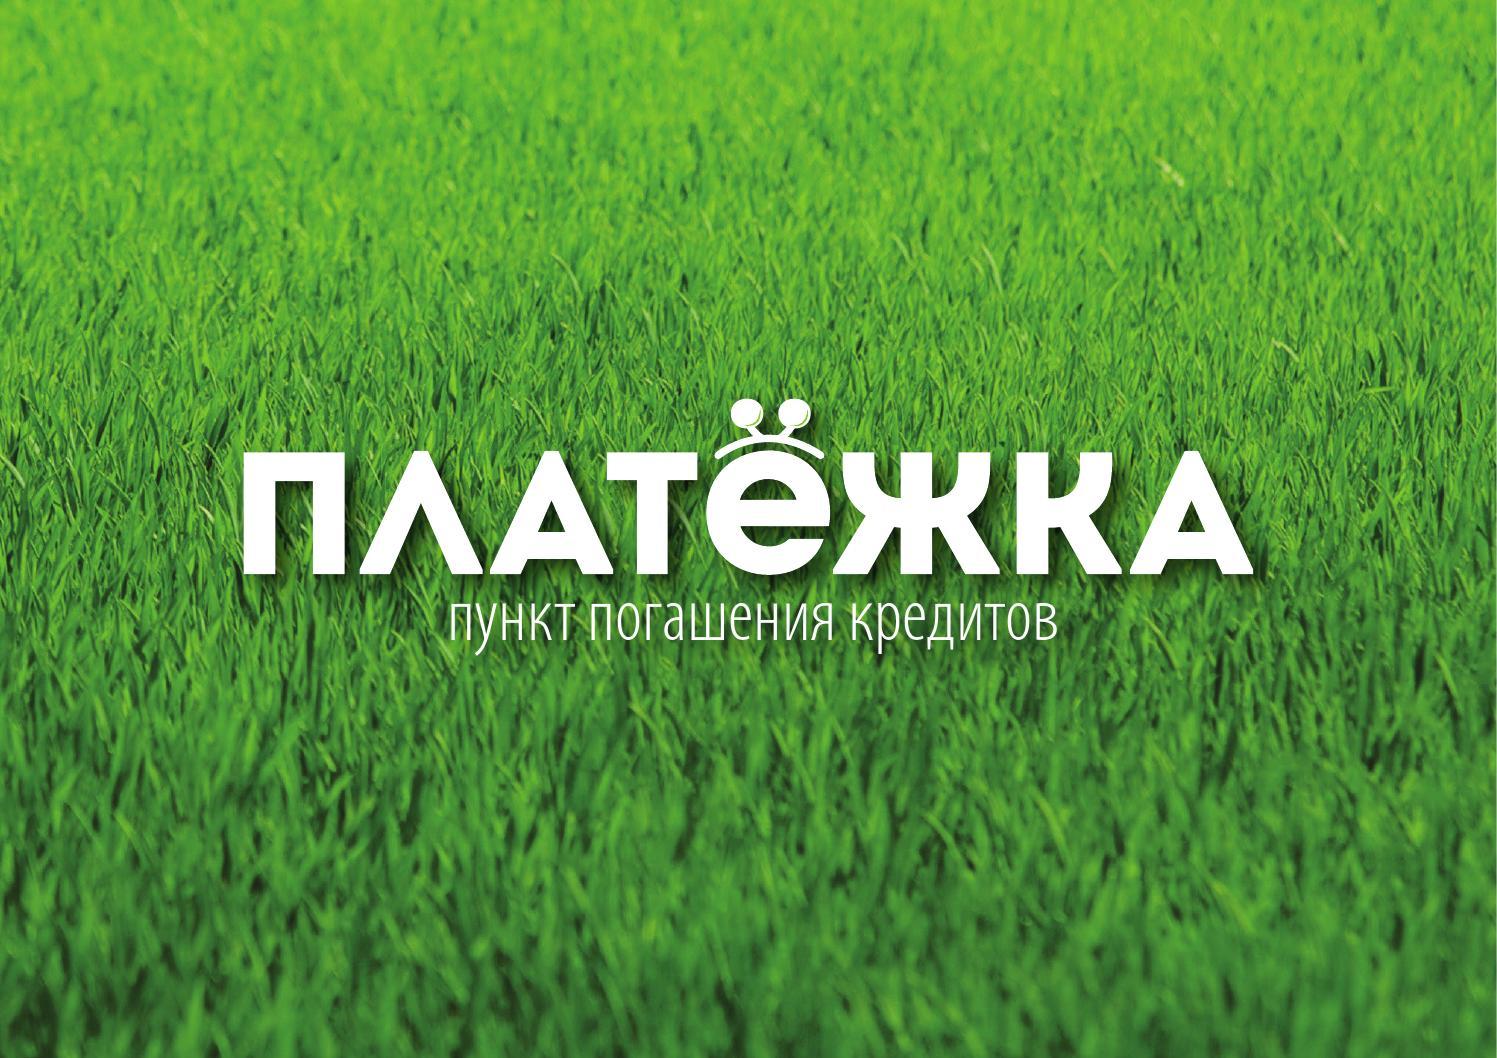 platezhka brand conception 1 by ruslan gashtov issuu. Black Bedroom Furniture Sets. Home Design Ideas